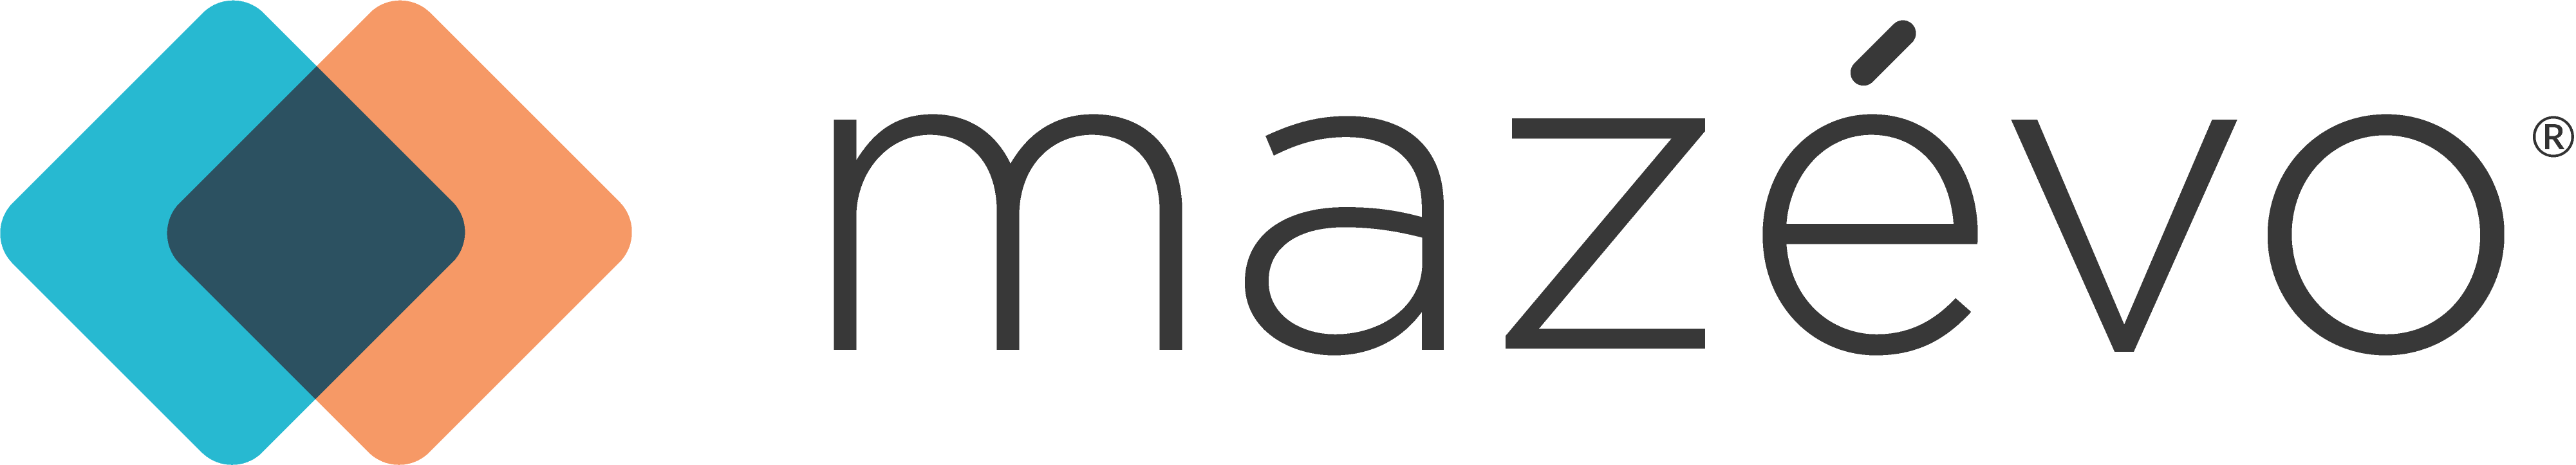 Mazevo Logo.png